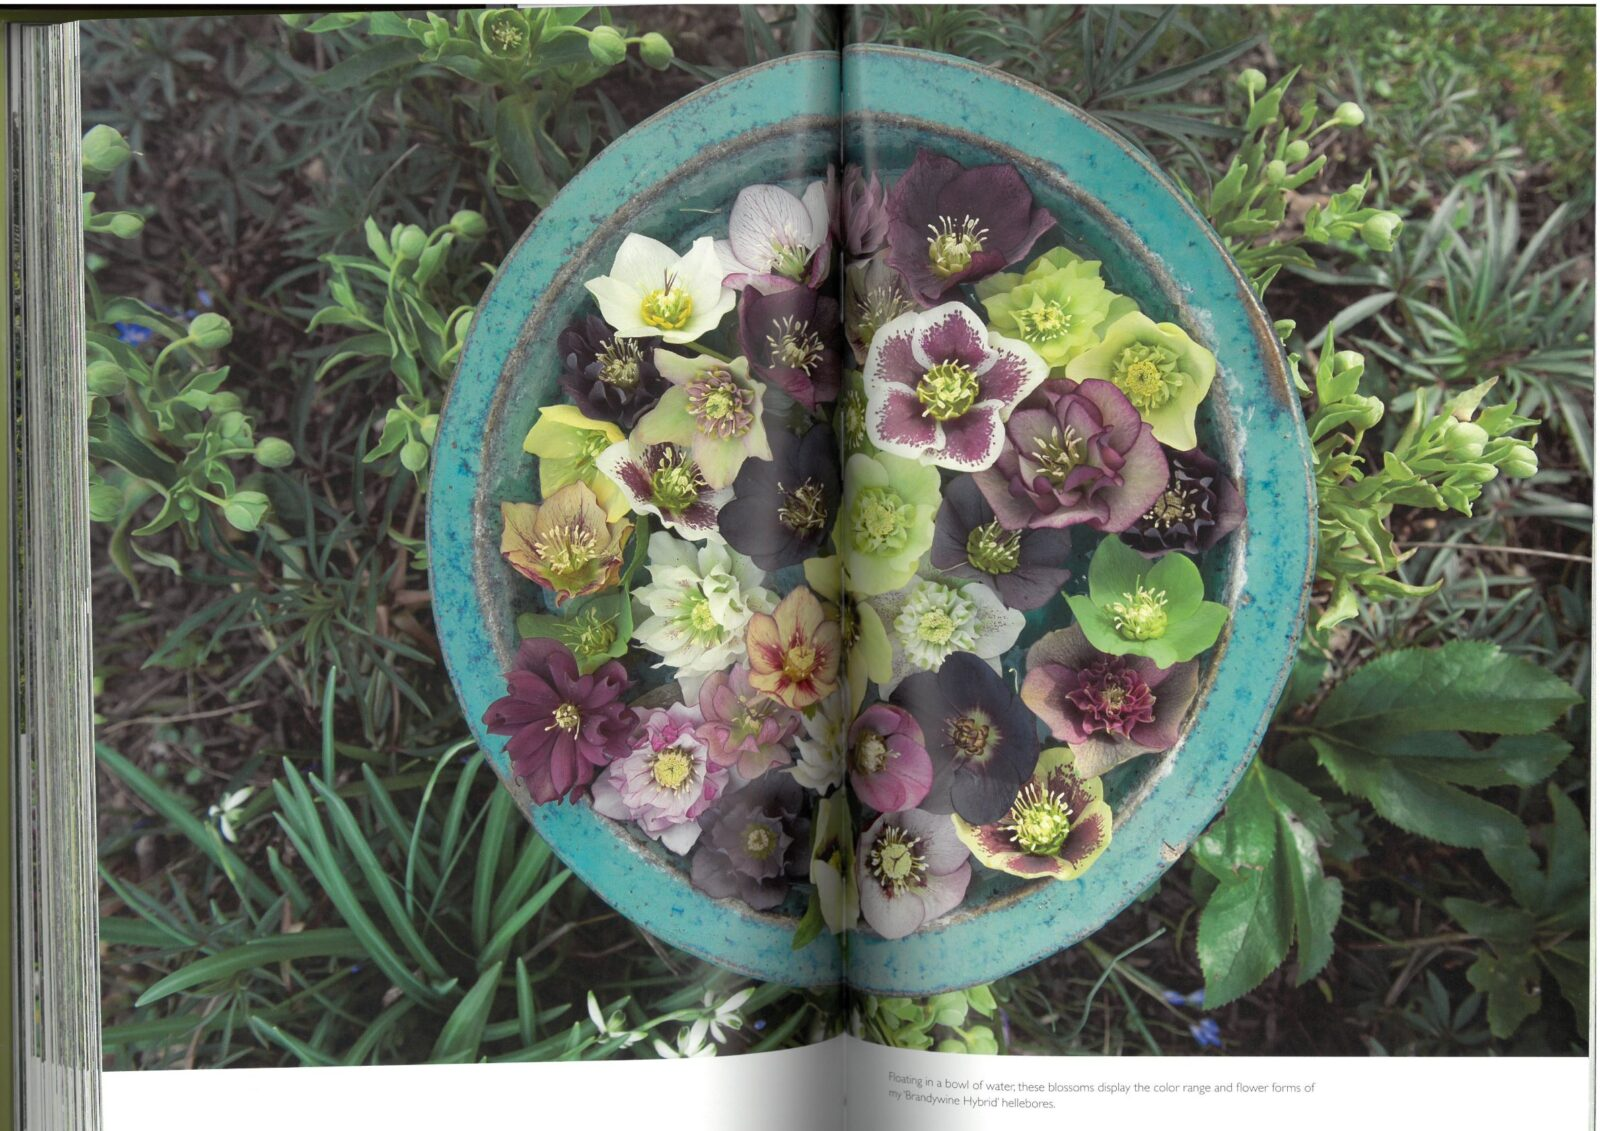 the layered garden - ciemierniki